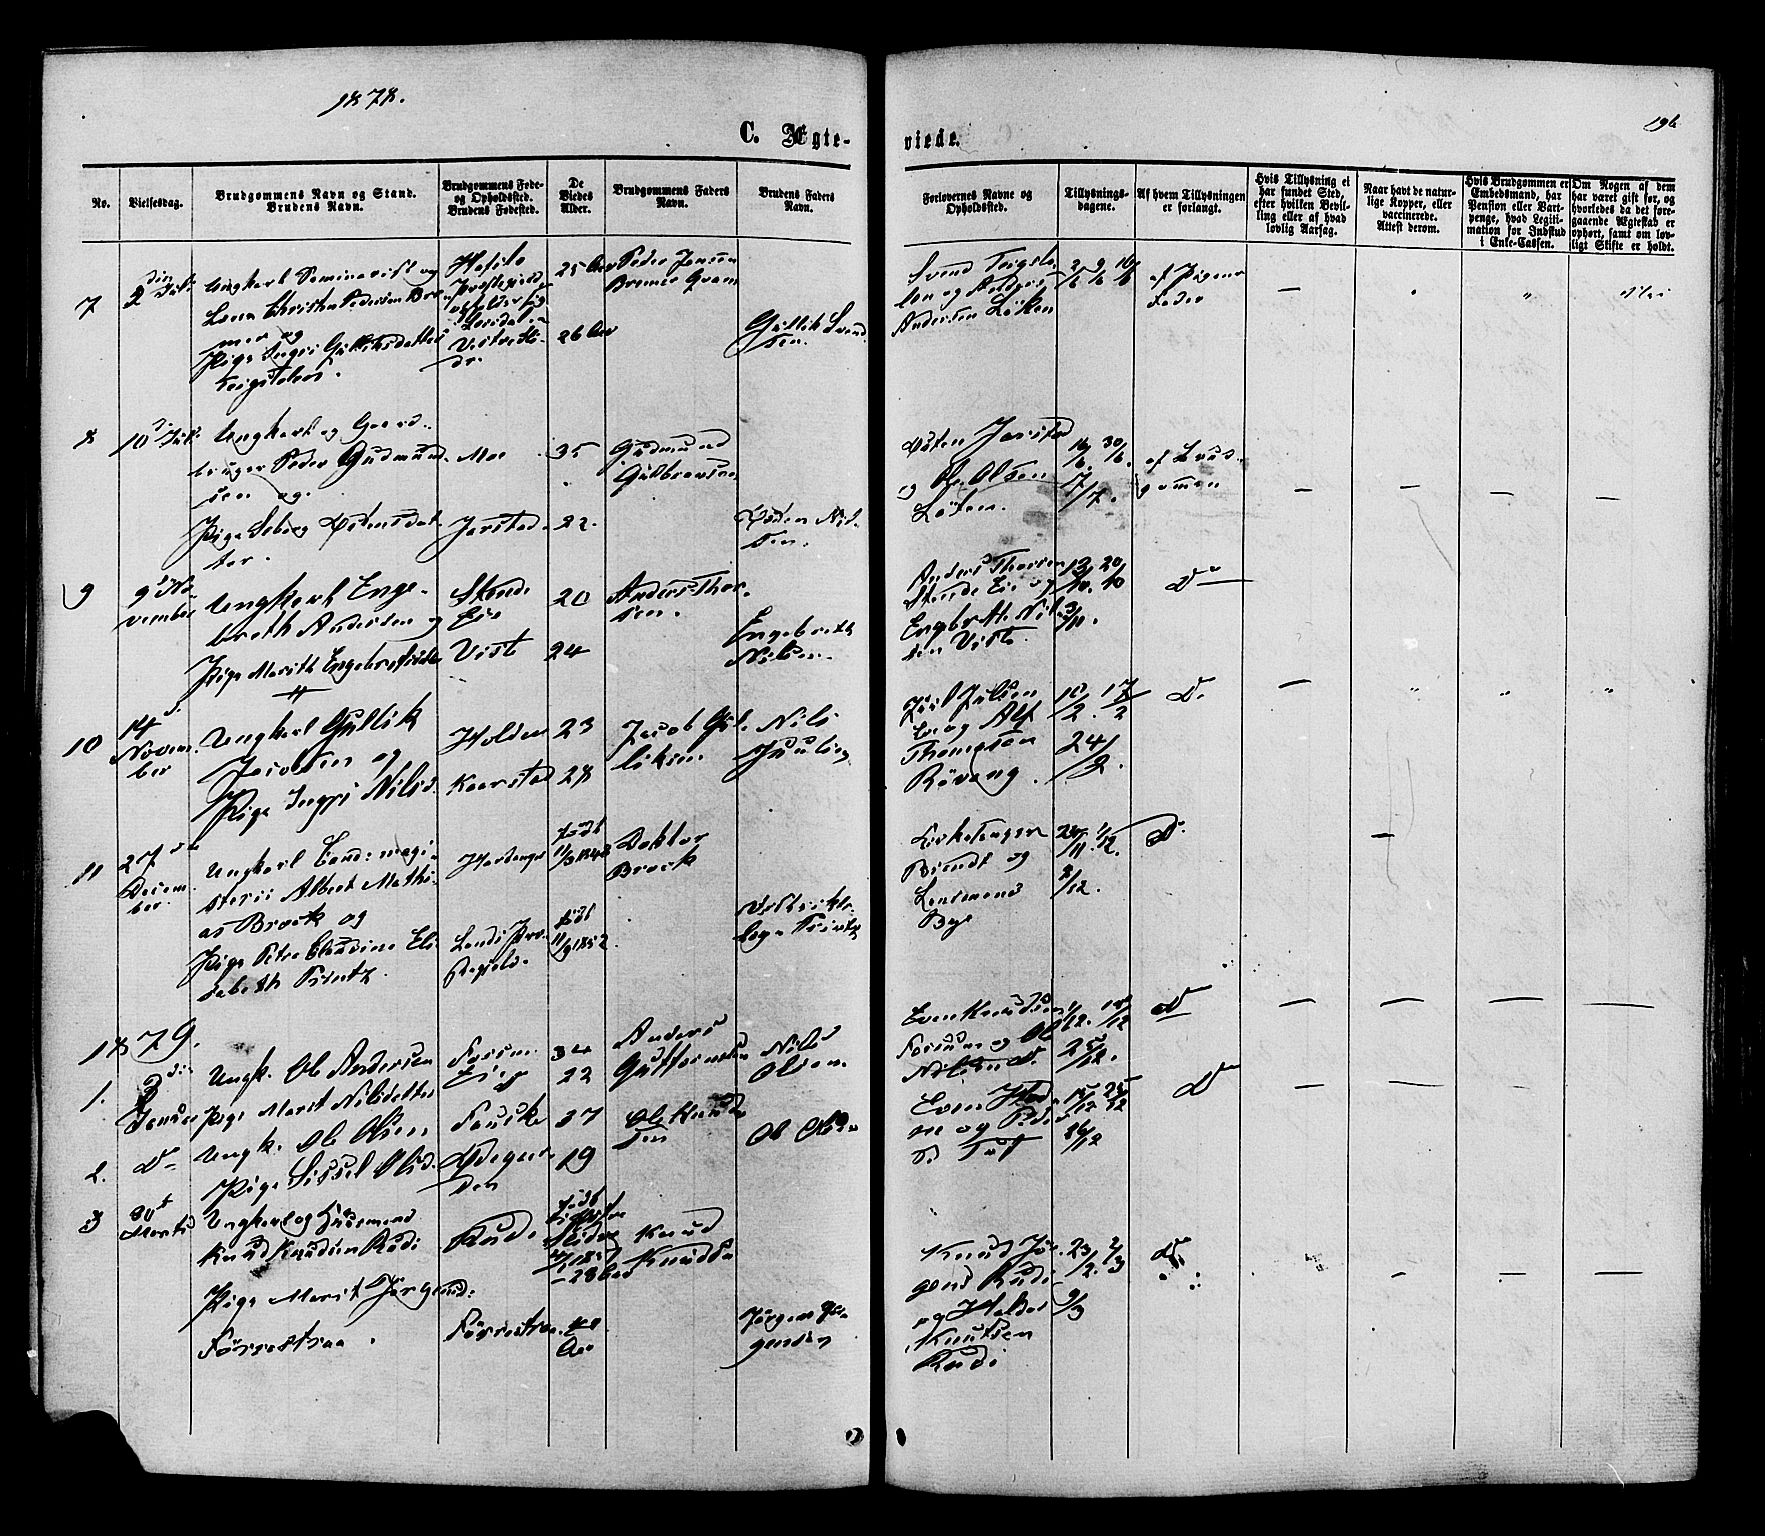 SAH, Vestre Slidre prestekontor, Ministerialbok nr. 3, 1865-1880, s. 196